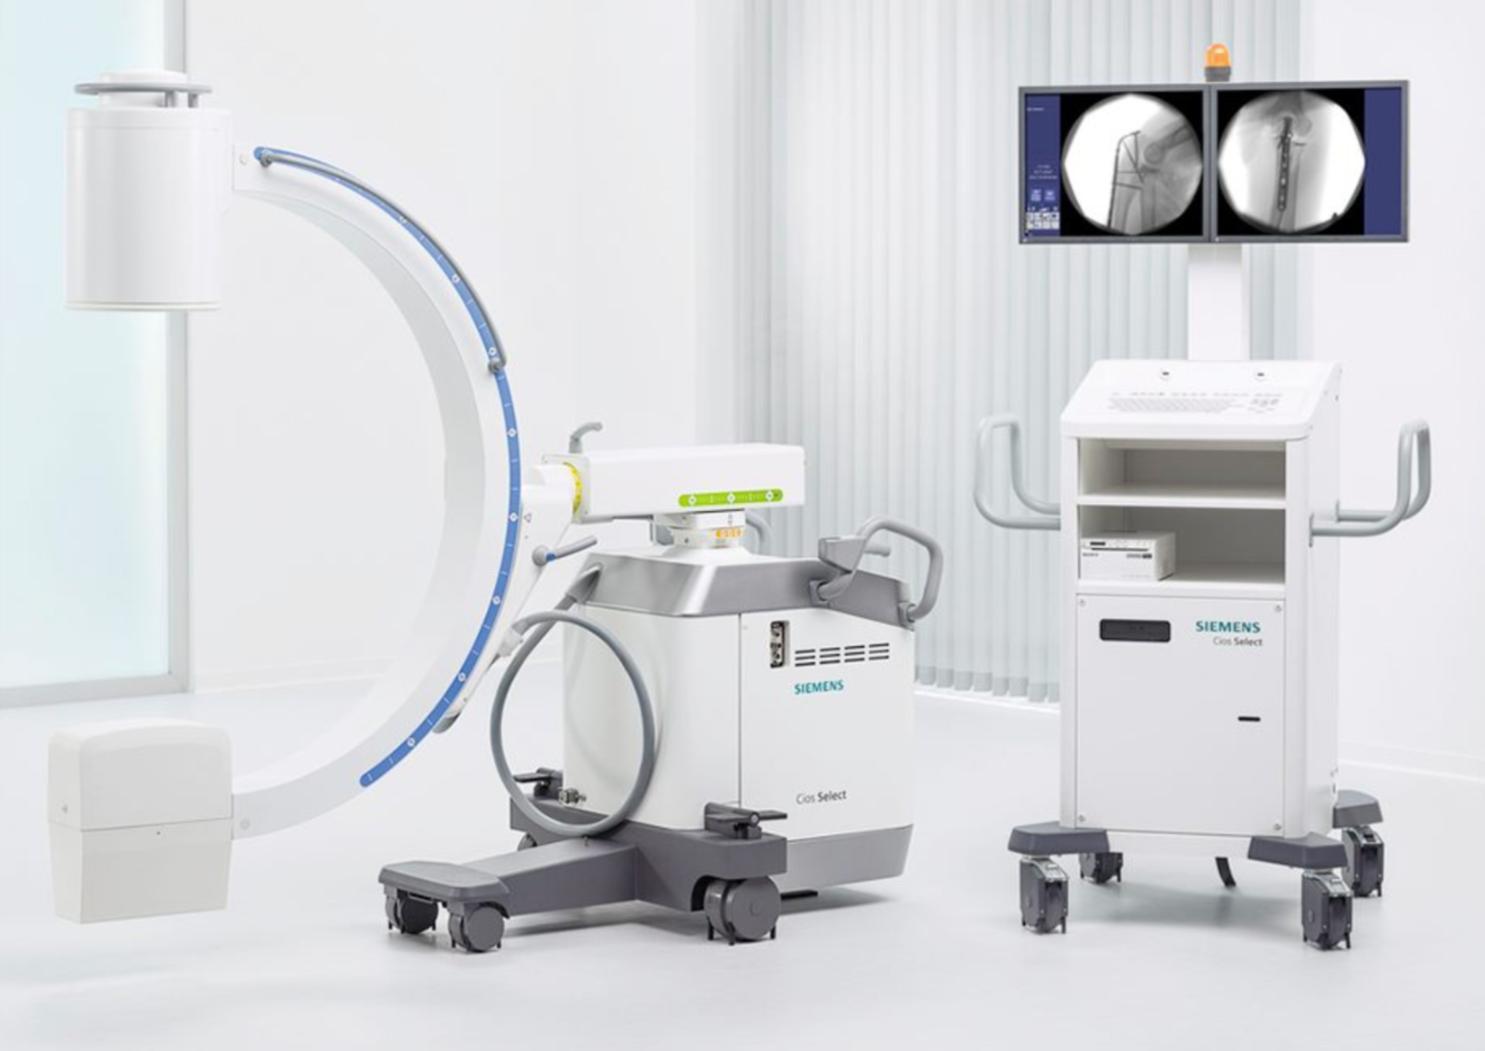 Siemens - Cios Select